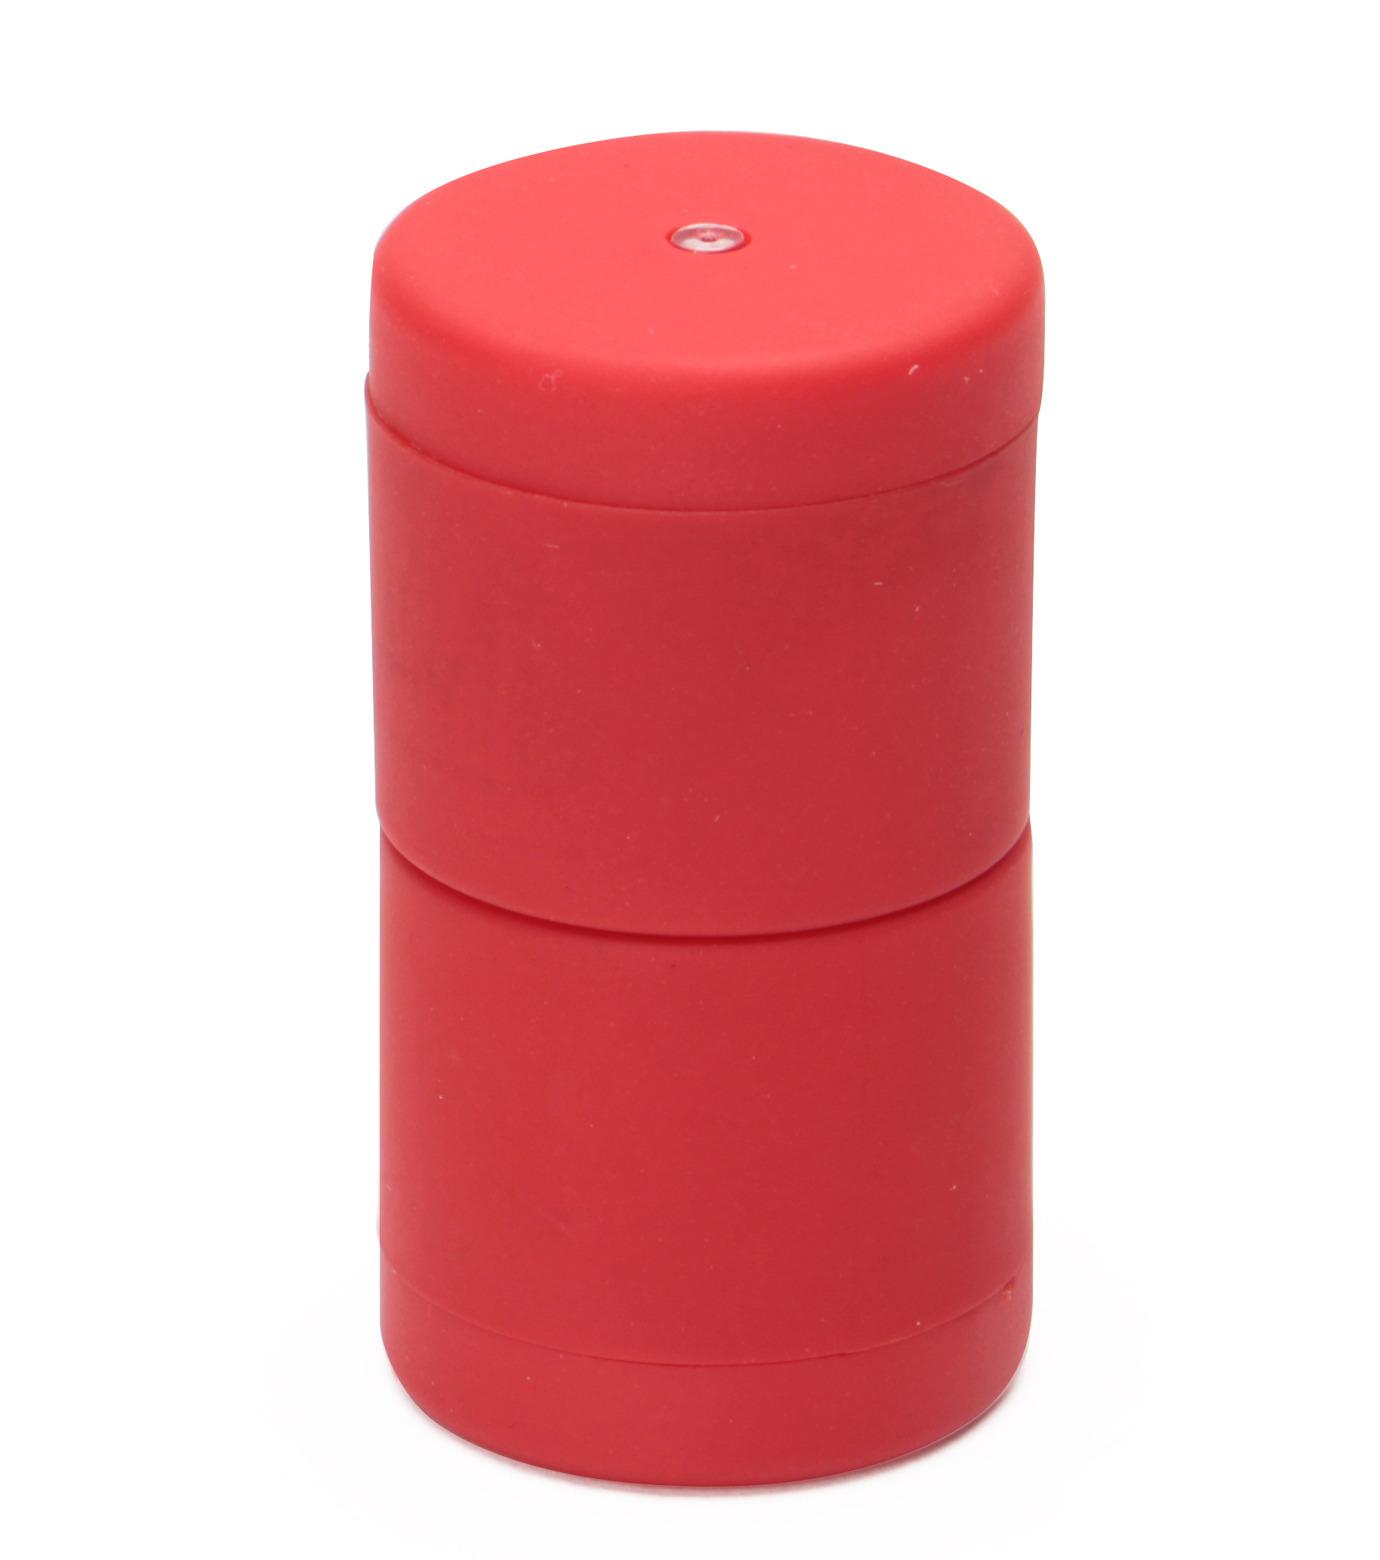 Palomar(パロマー)のLucetta-RED(ガジェット/ライト/gadgets/light)-2877RD-62 拡大詳細画像1